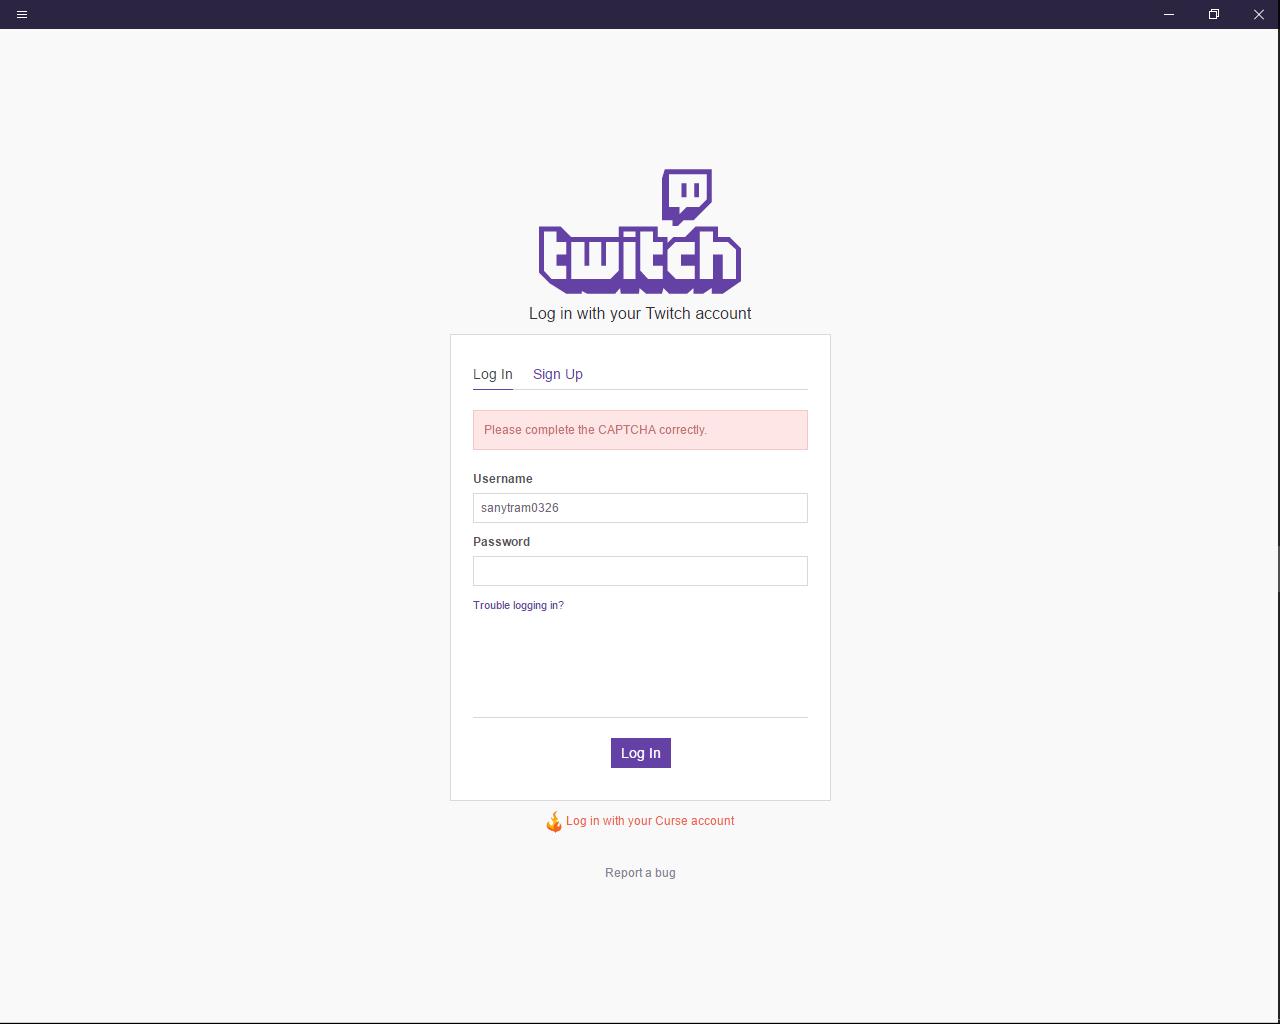 Cant login, please complete captcha problem - API - Twitch